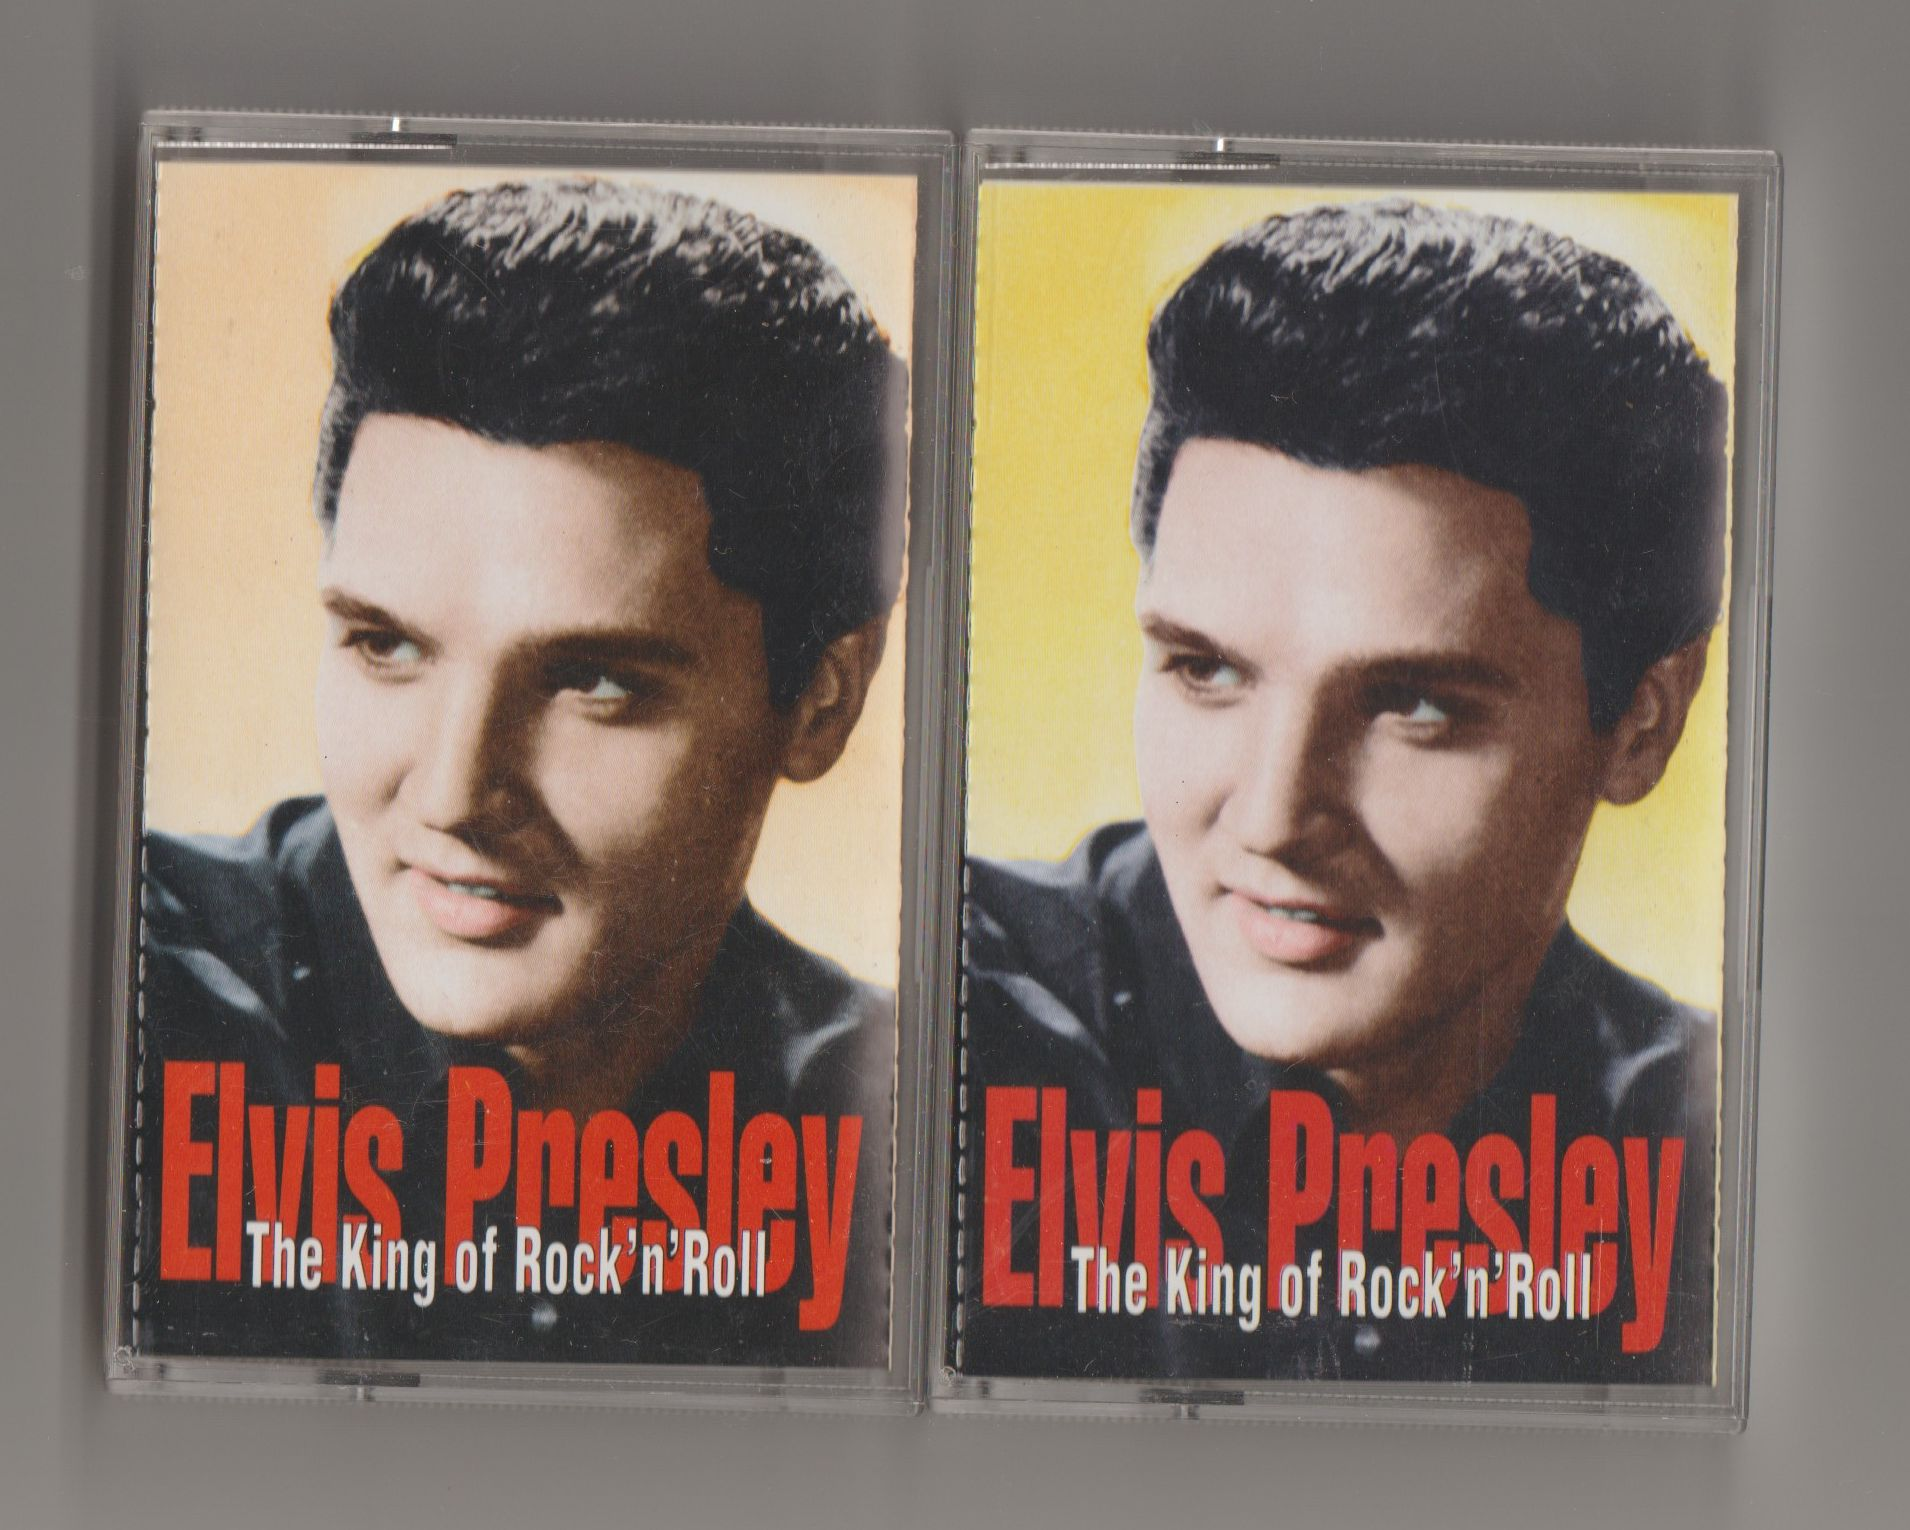 Elvis Presley - The King of Rock'n'Roll (soubor 2 MC kazet)